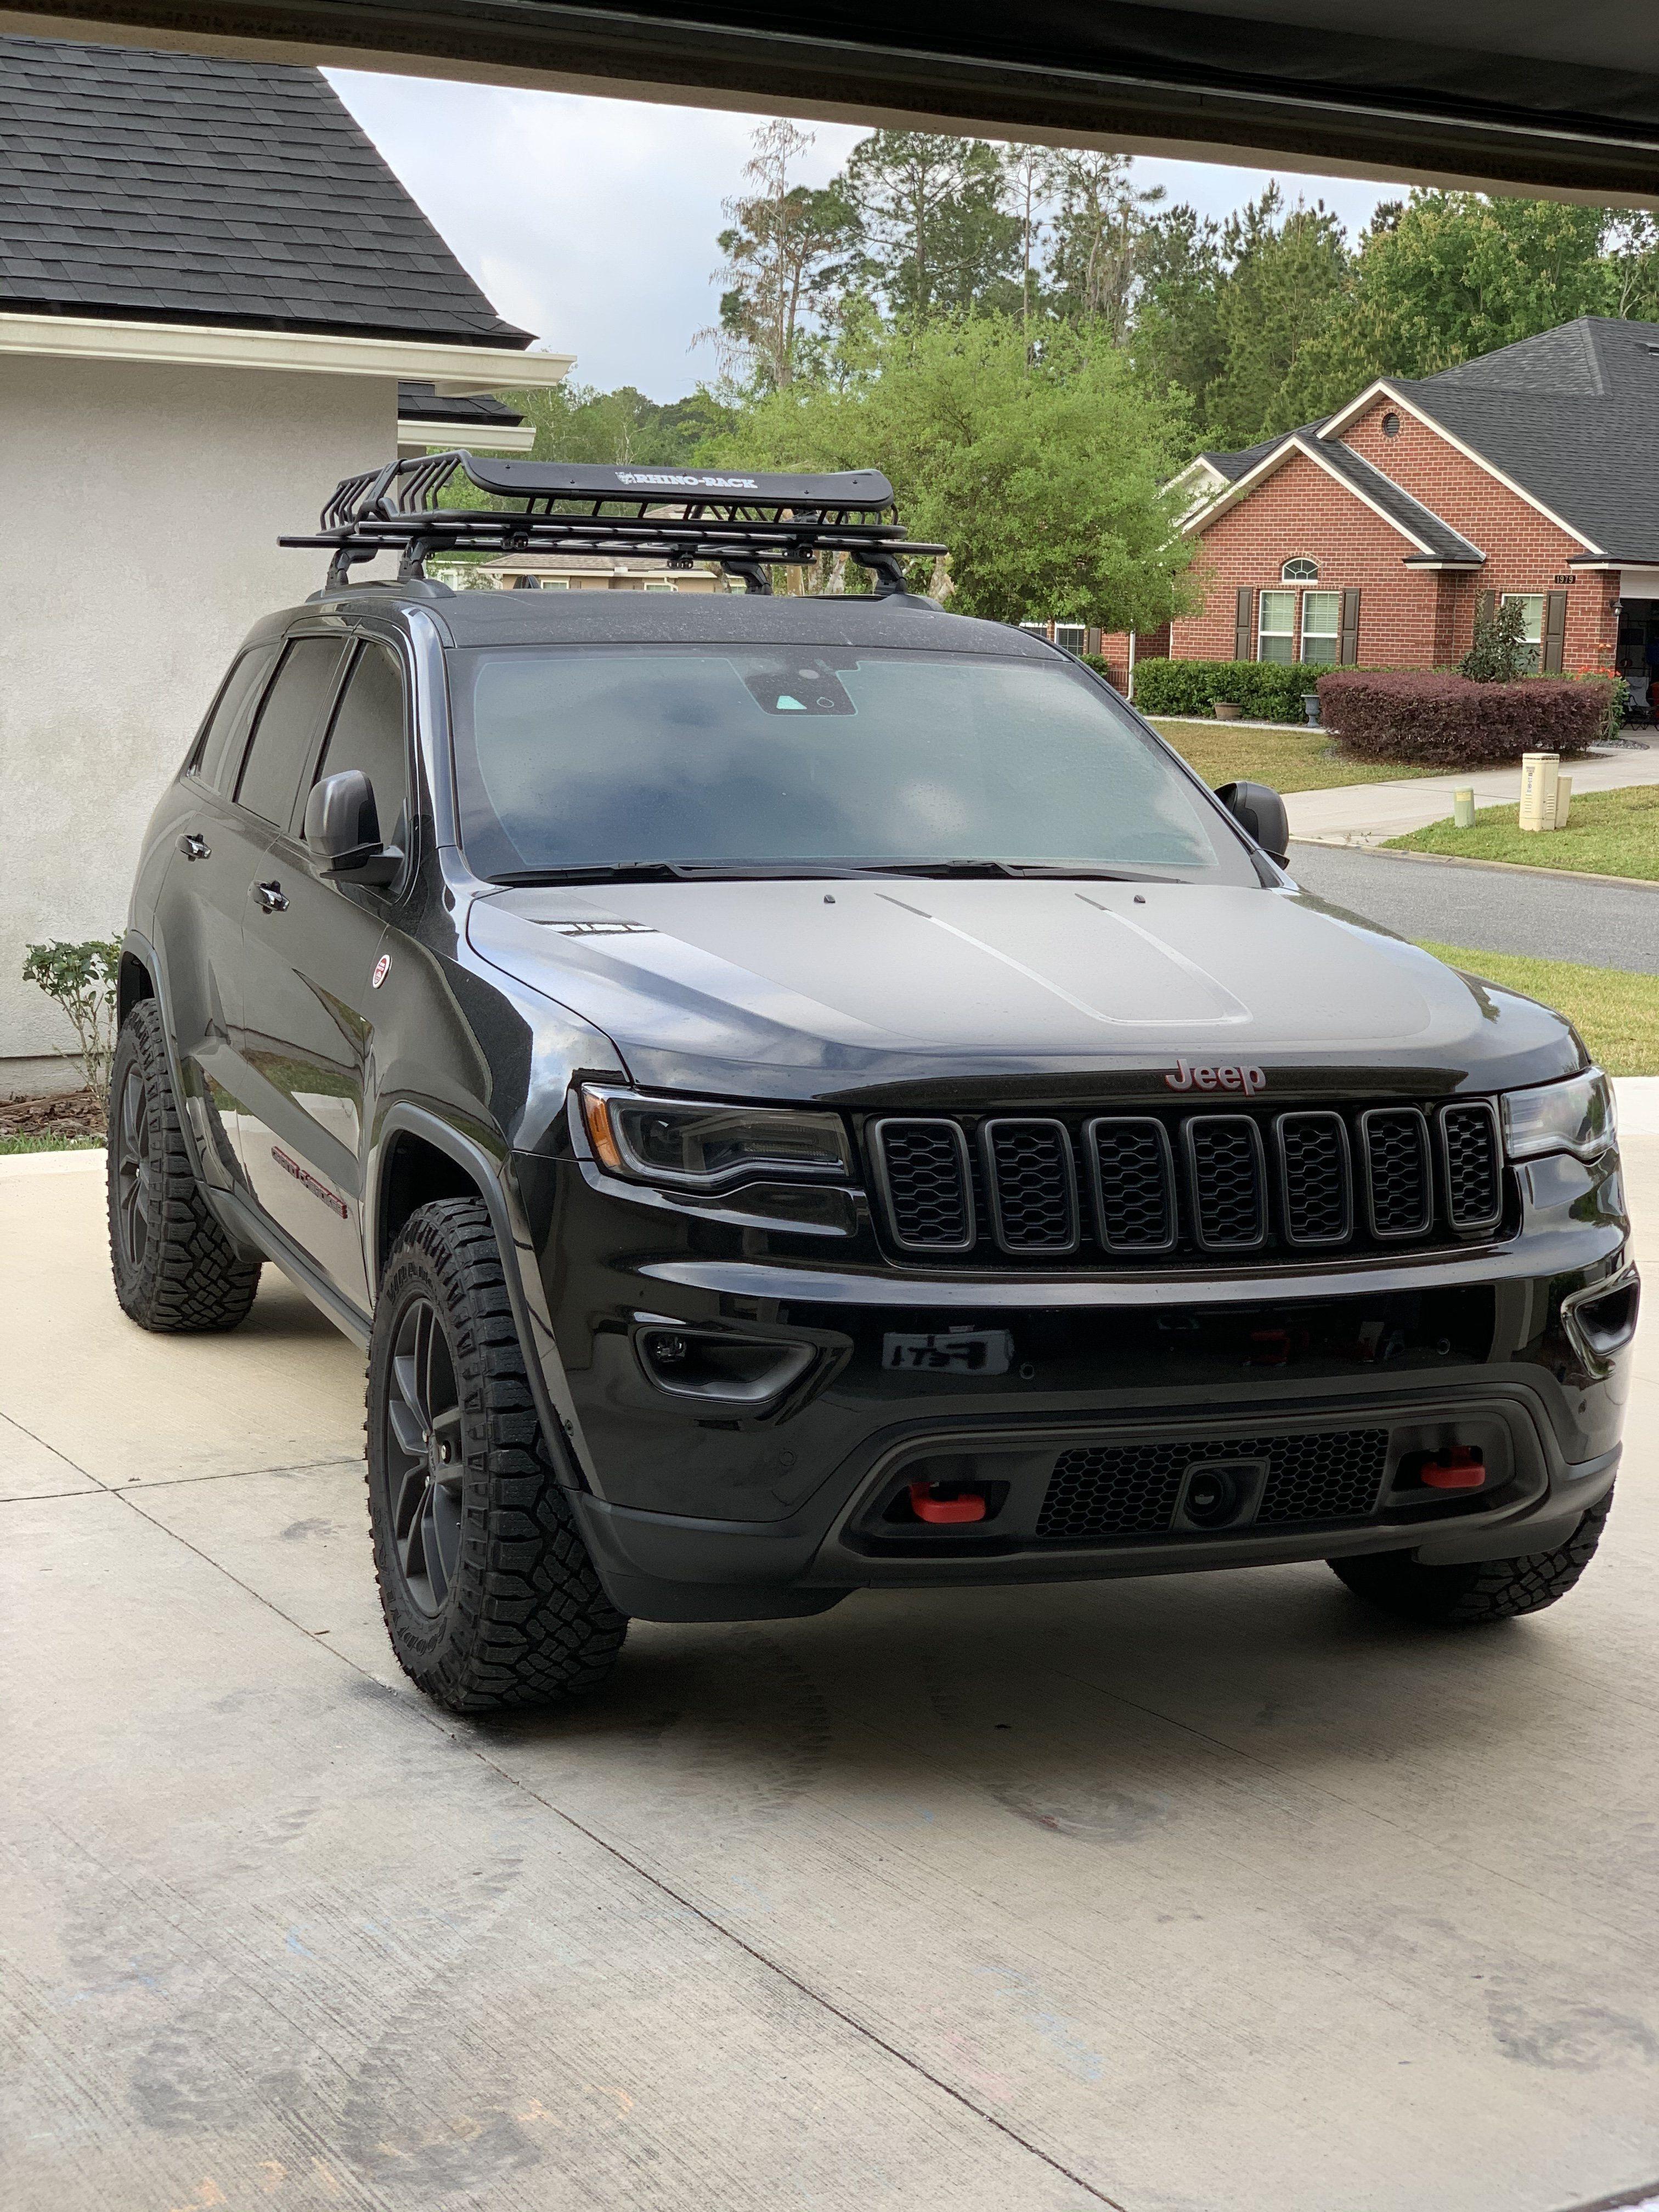 2014 Jeep Grand Cherokee Lifted : grand, cherokee, lifted, Ideas, Grand, Cherokee,, Jeep,